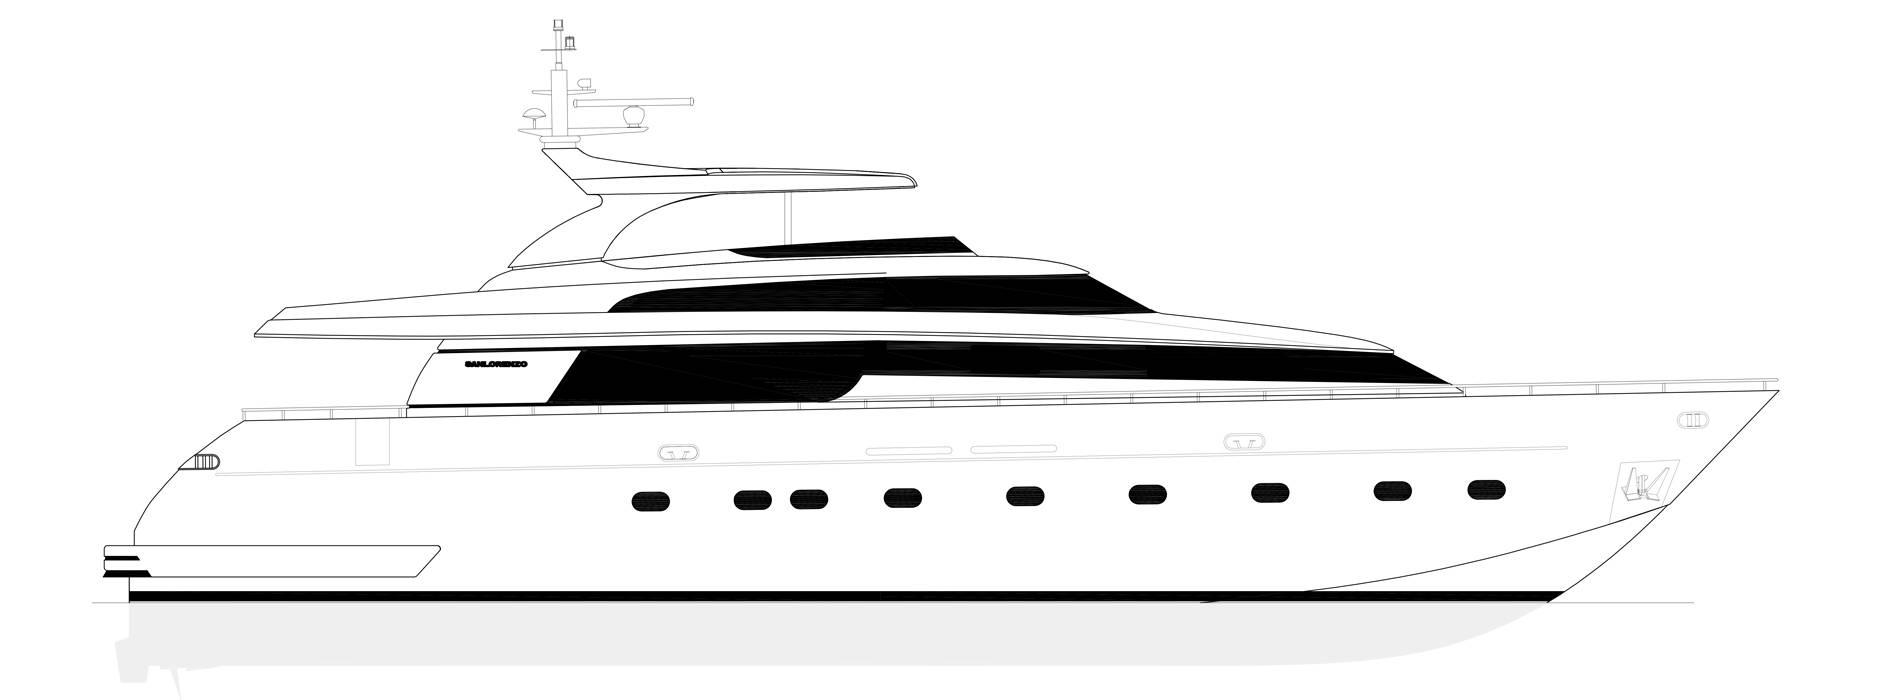 Sanlorenzo Yachts SL88-541 Profile